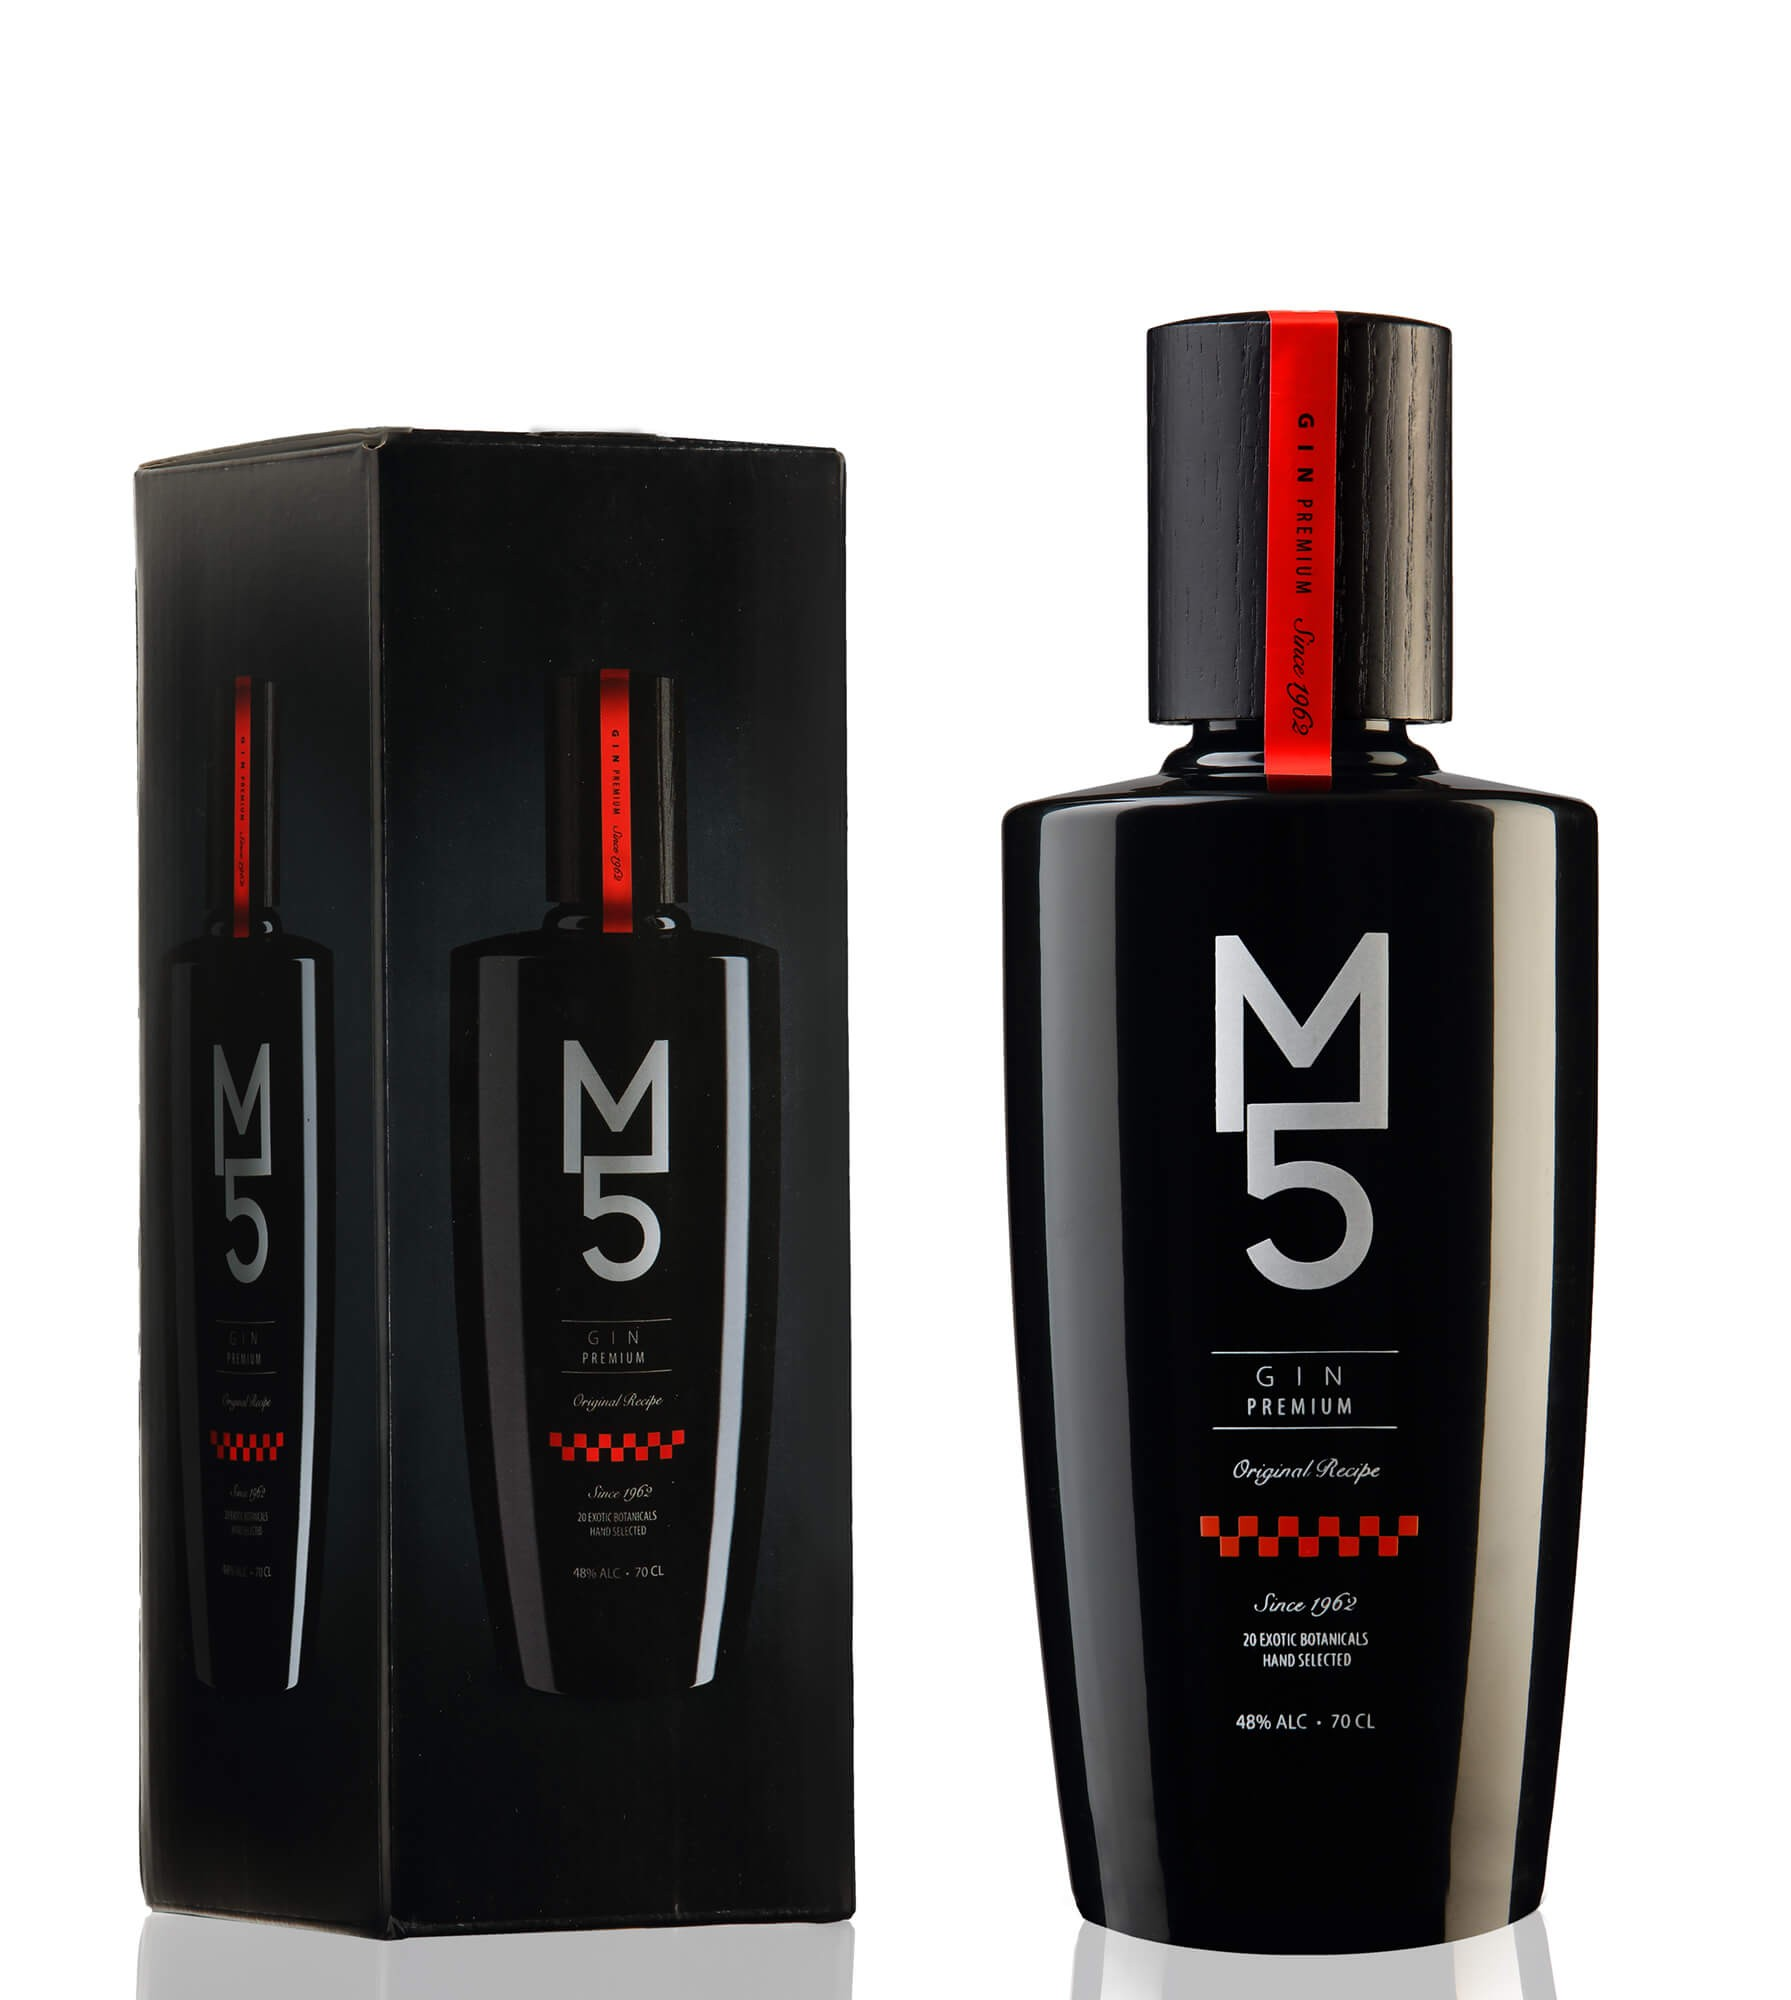 GIN M 5 PREMIUM 70cl. 48%